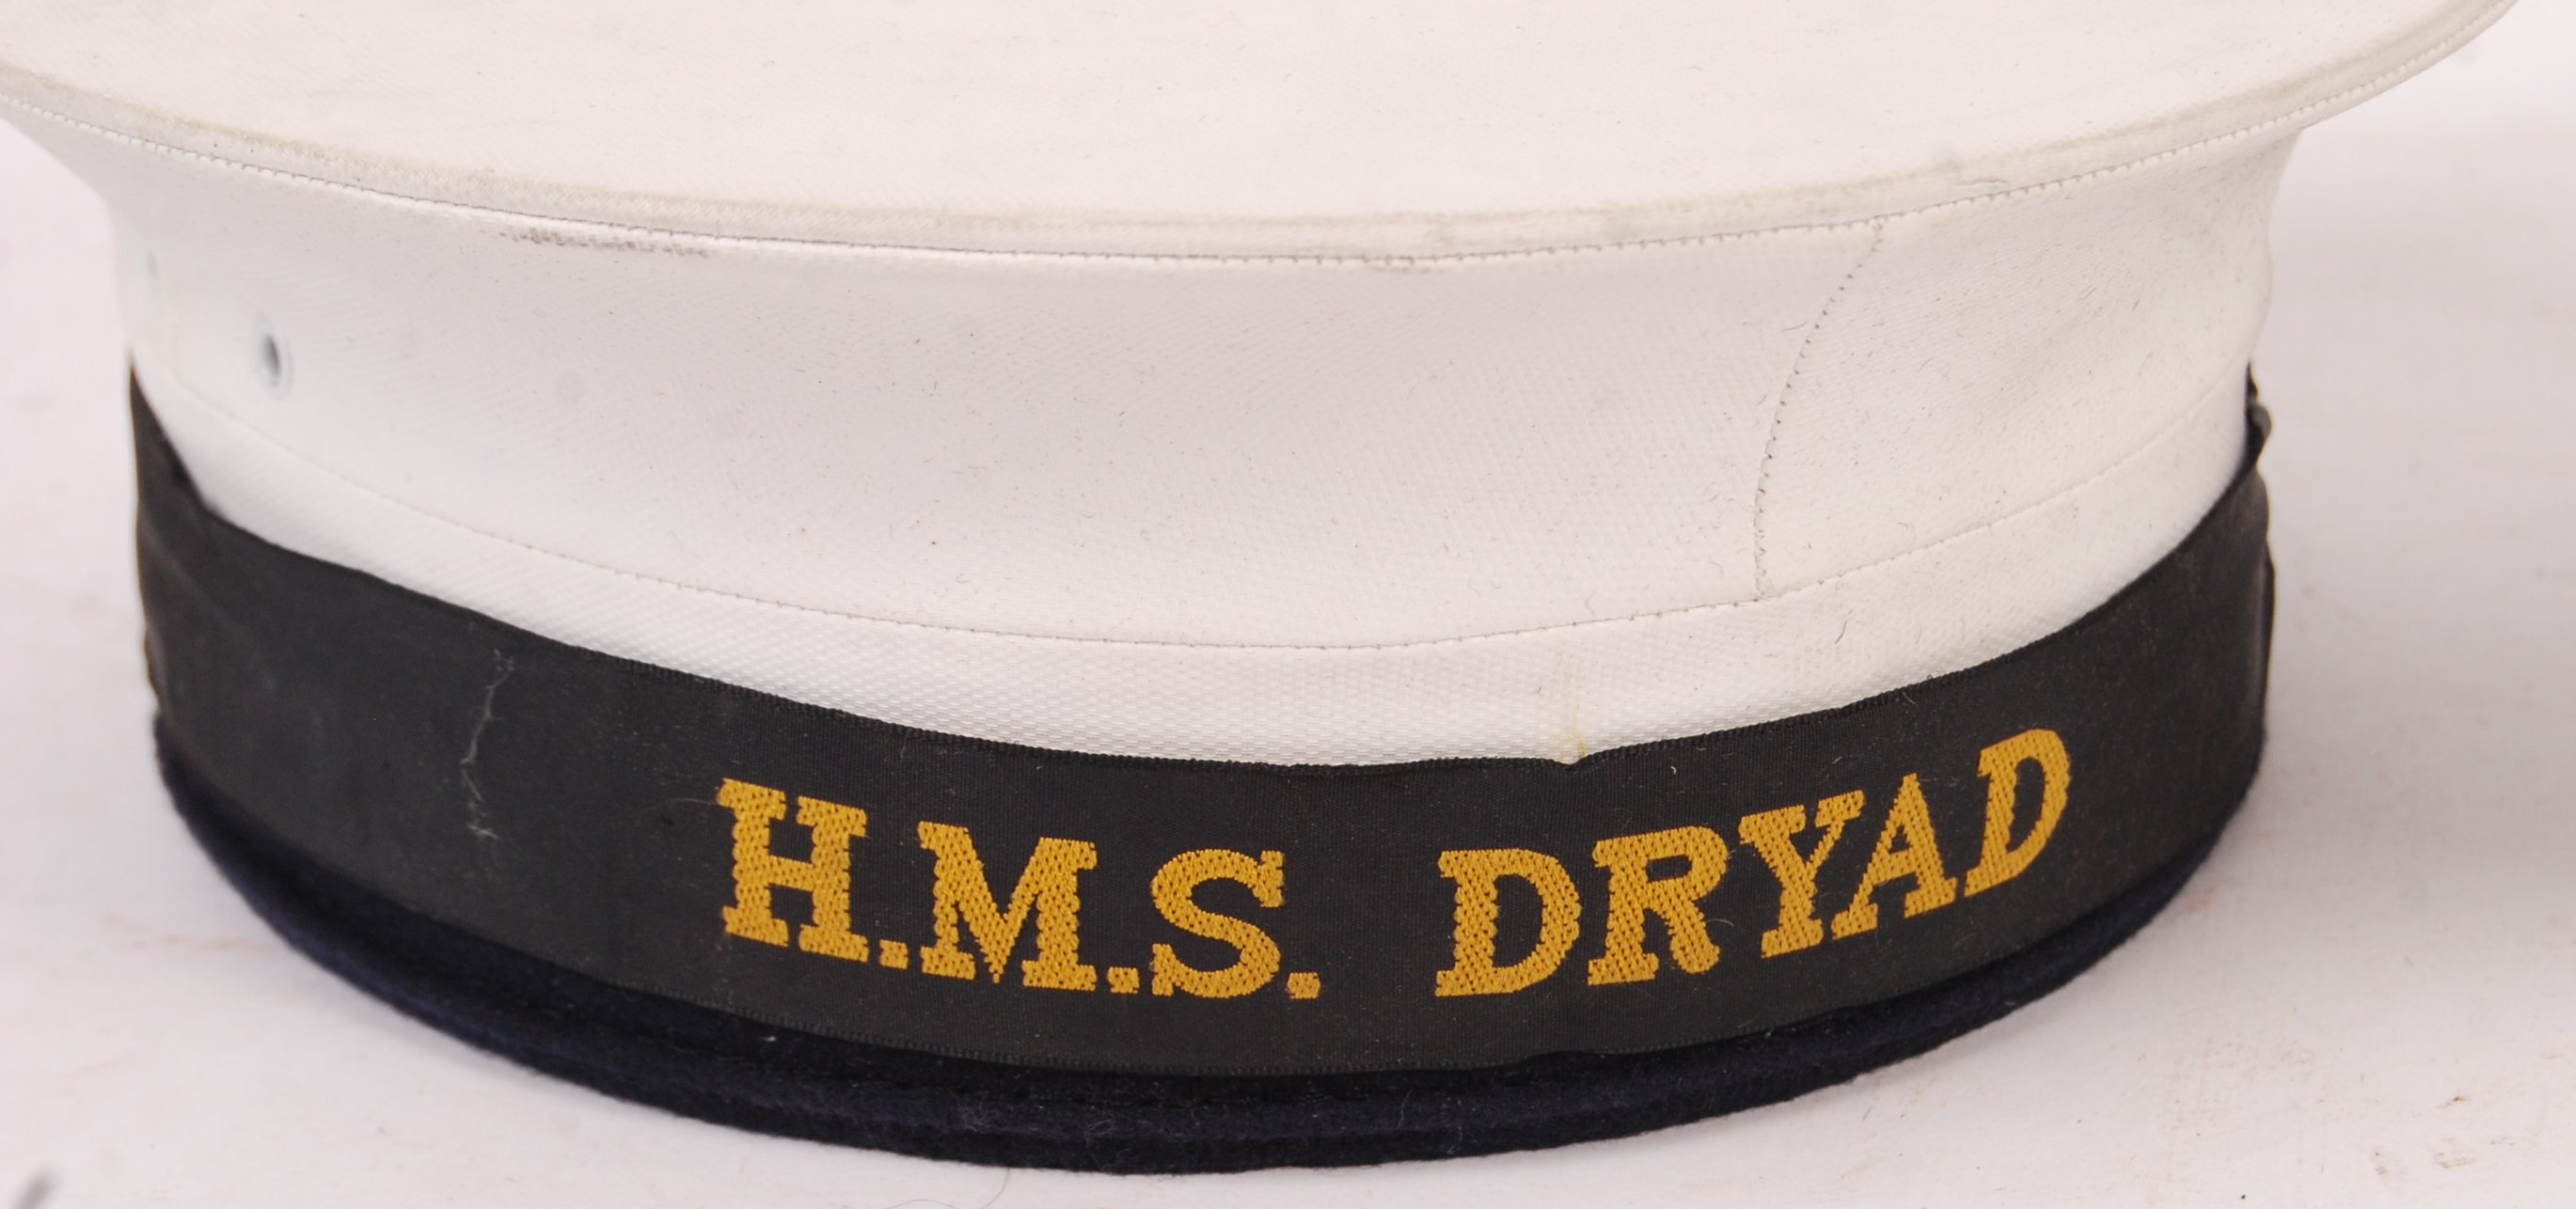 Lot 184 - TWO 20TH CENTURY ROYAL NAVY UNIFORM CAPS / HATS